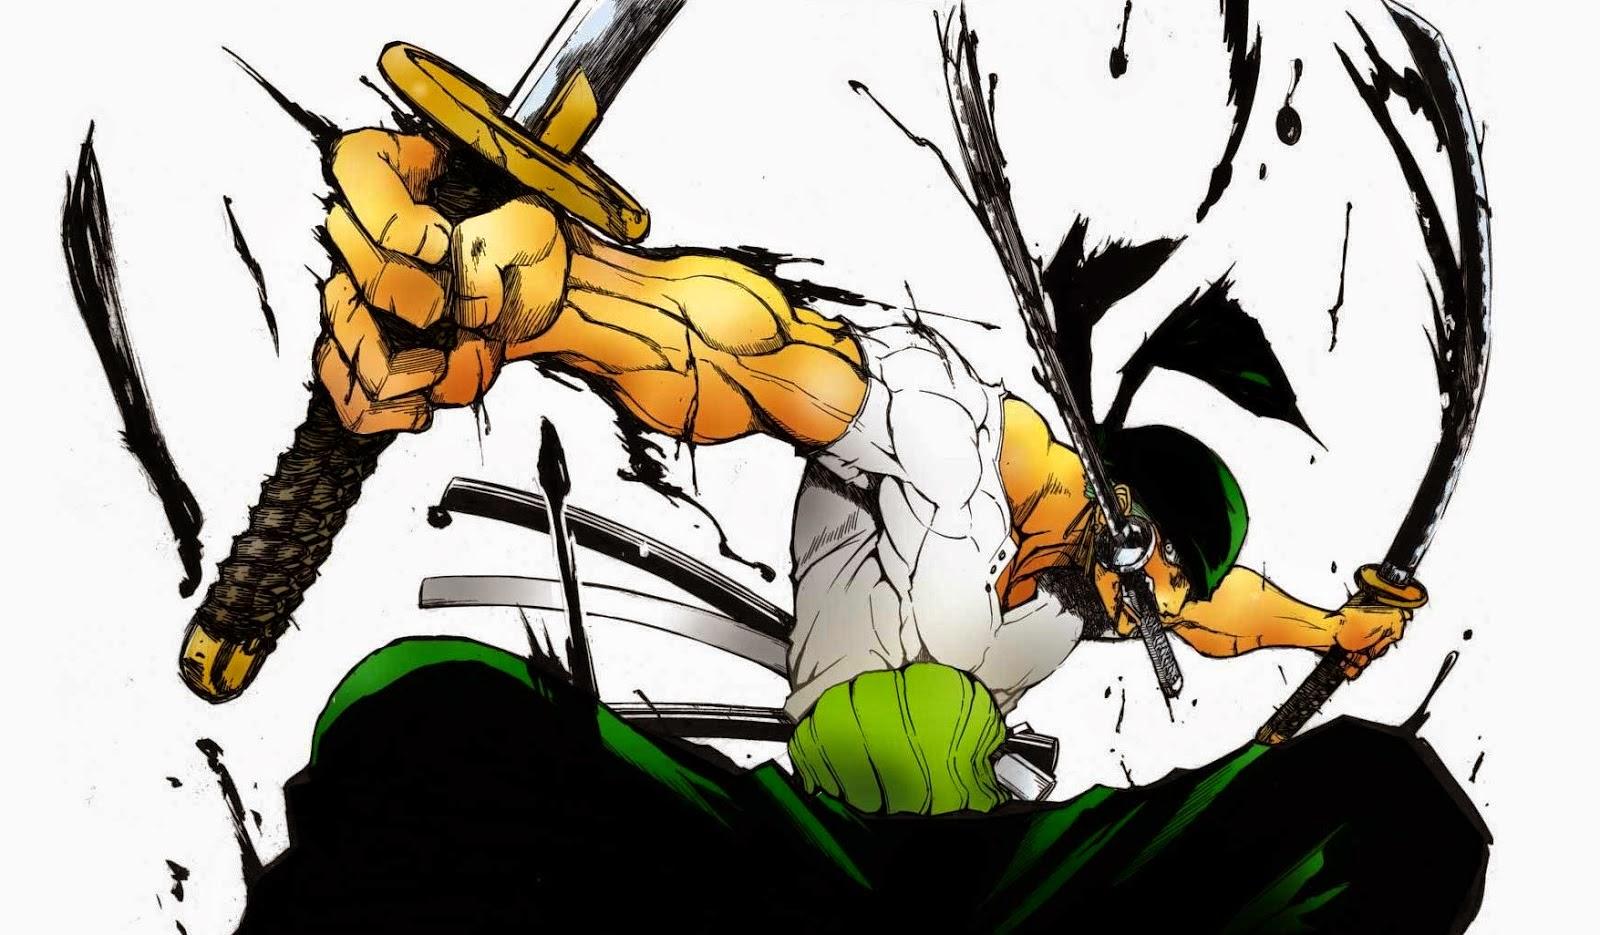 Anime Wallpapers RORONOA ZORO WALLPAPERS